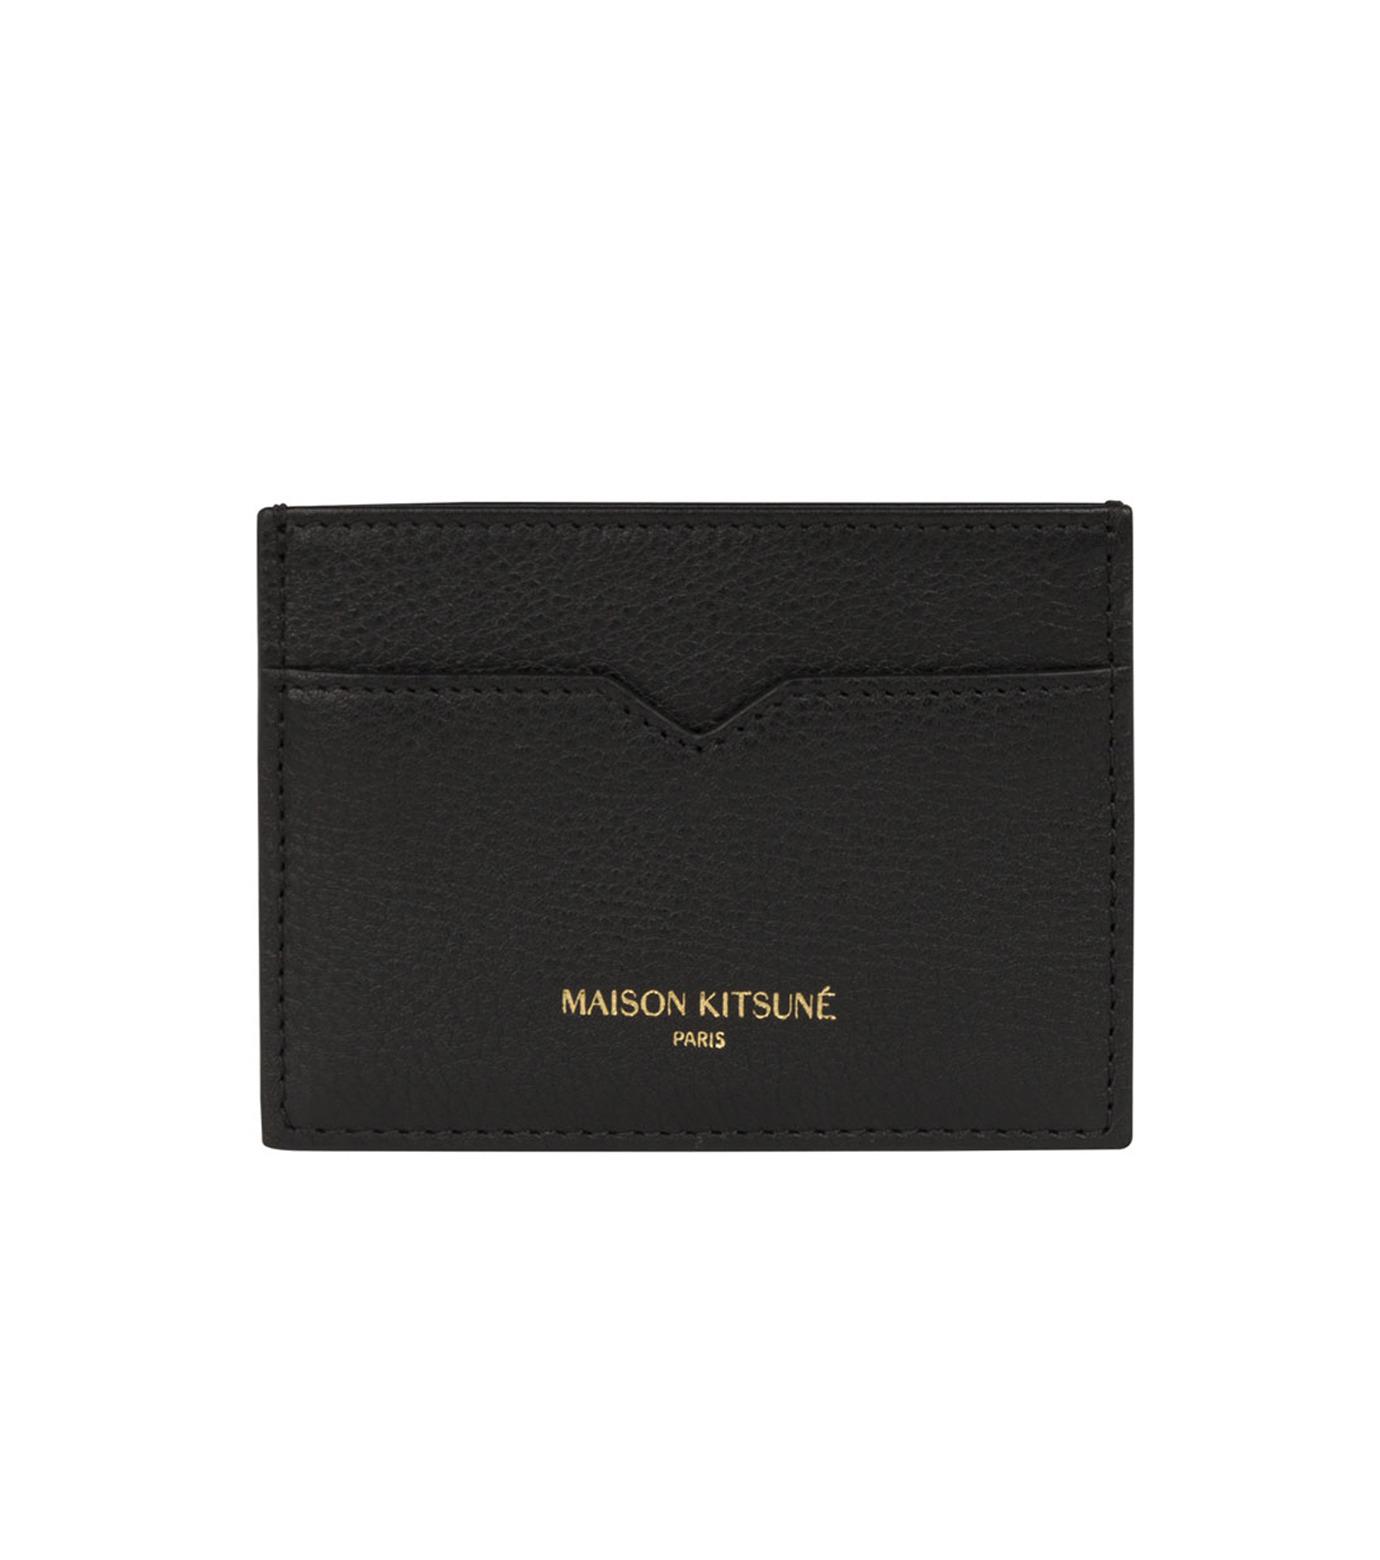 MAISON KITSUNÉ(メゾンキツネ)のcard holder-BLACK(WALLETS/WALLETS)-KUZ8600-13 拡大詳細画像1